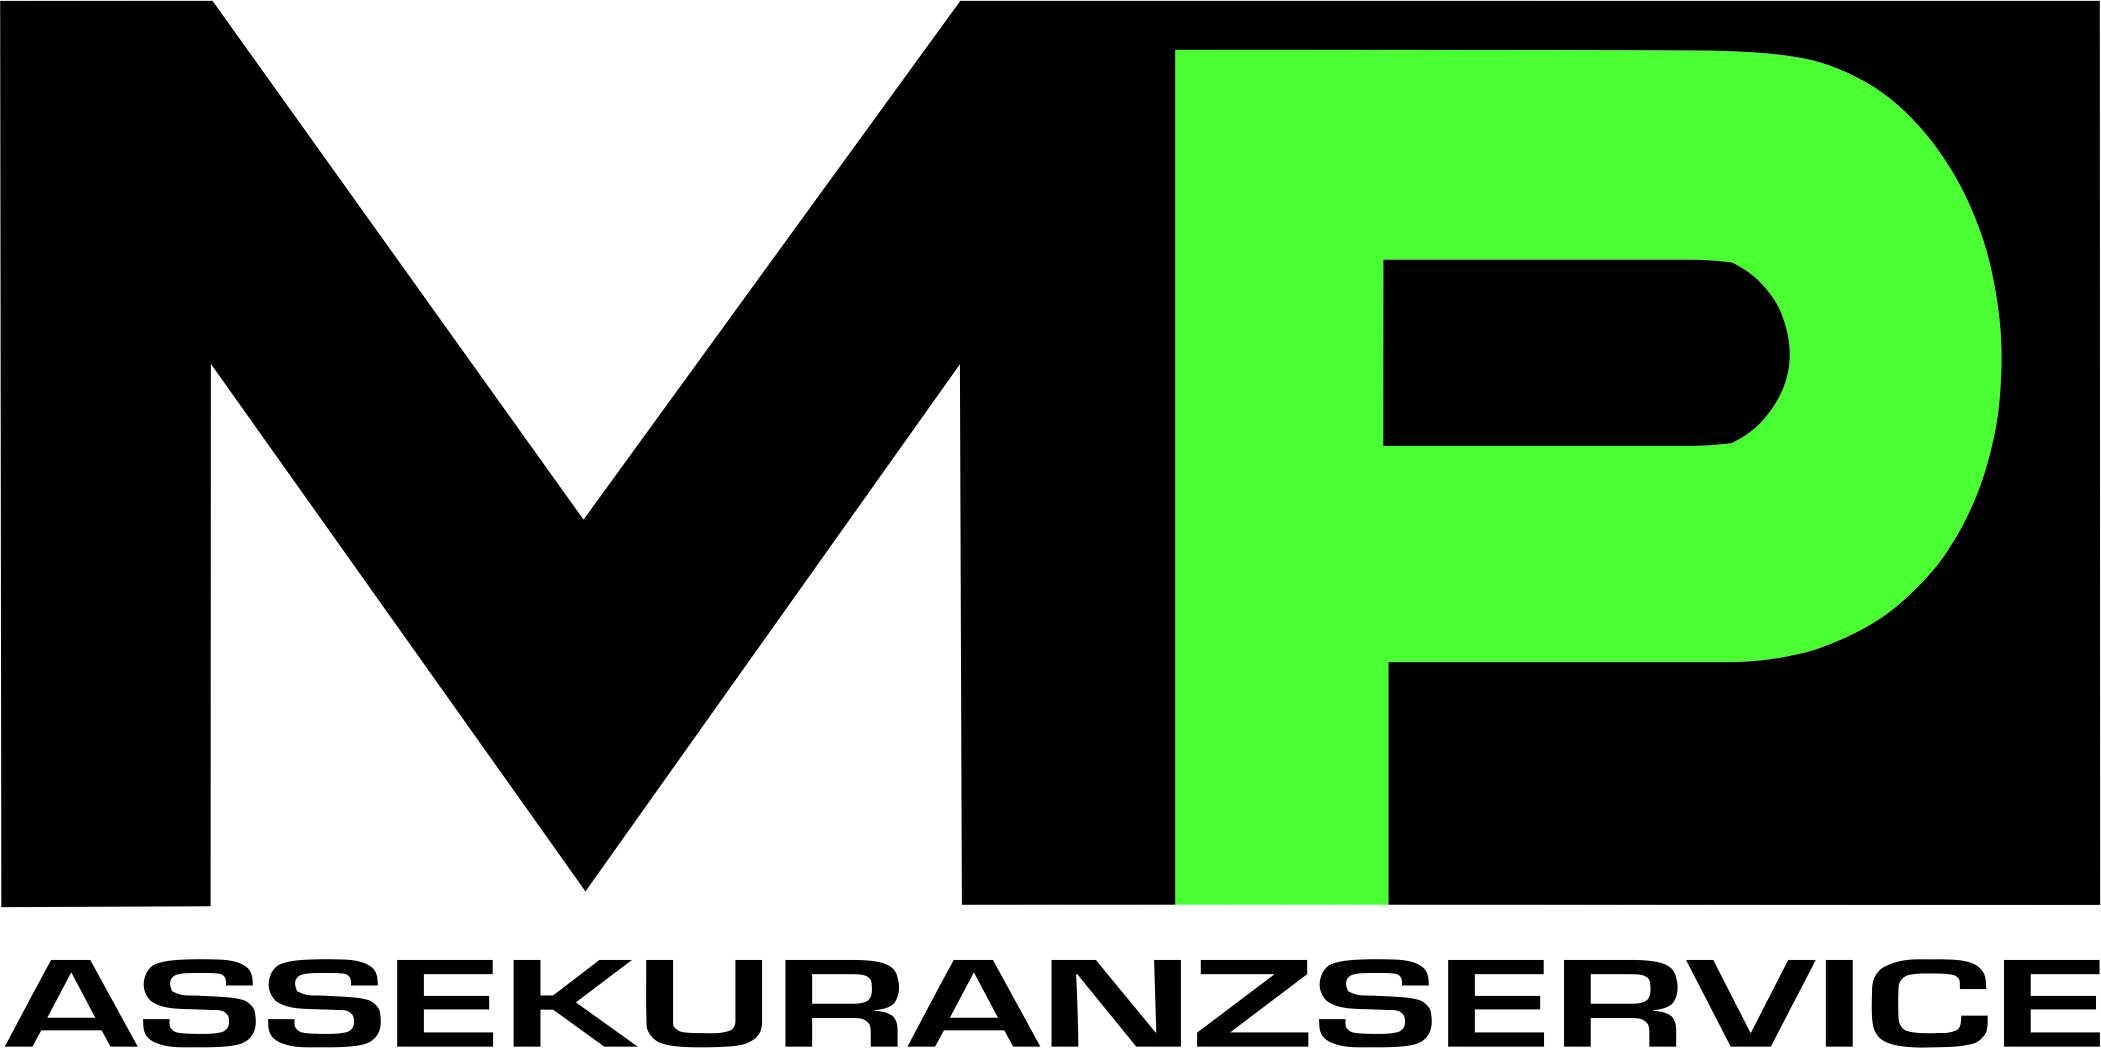 MP Assekuranzservice